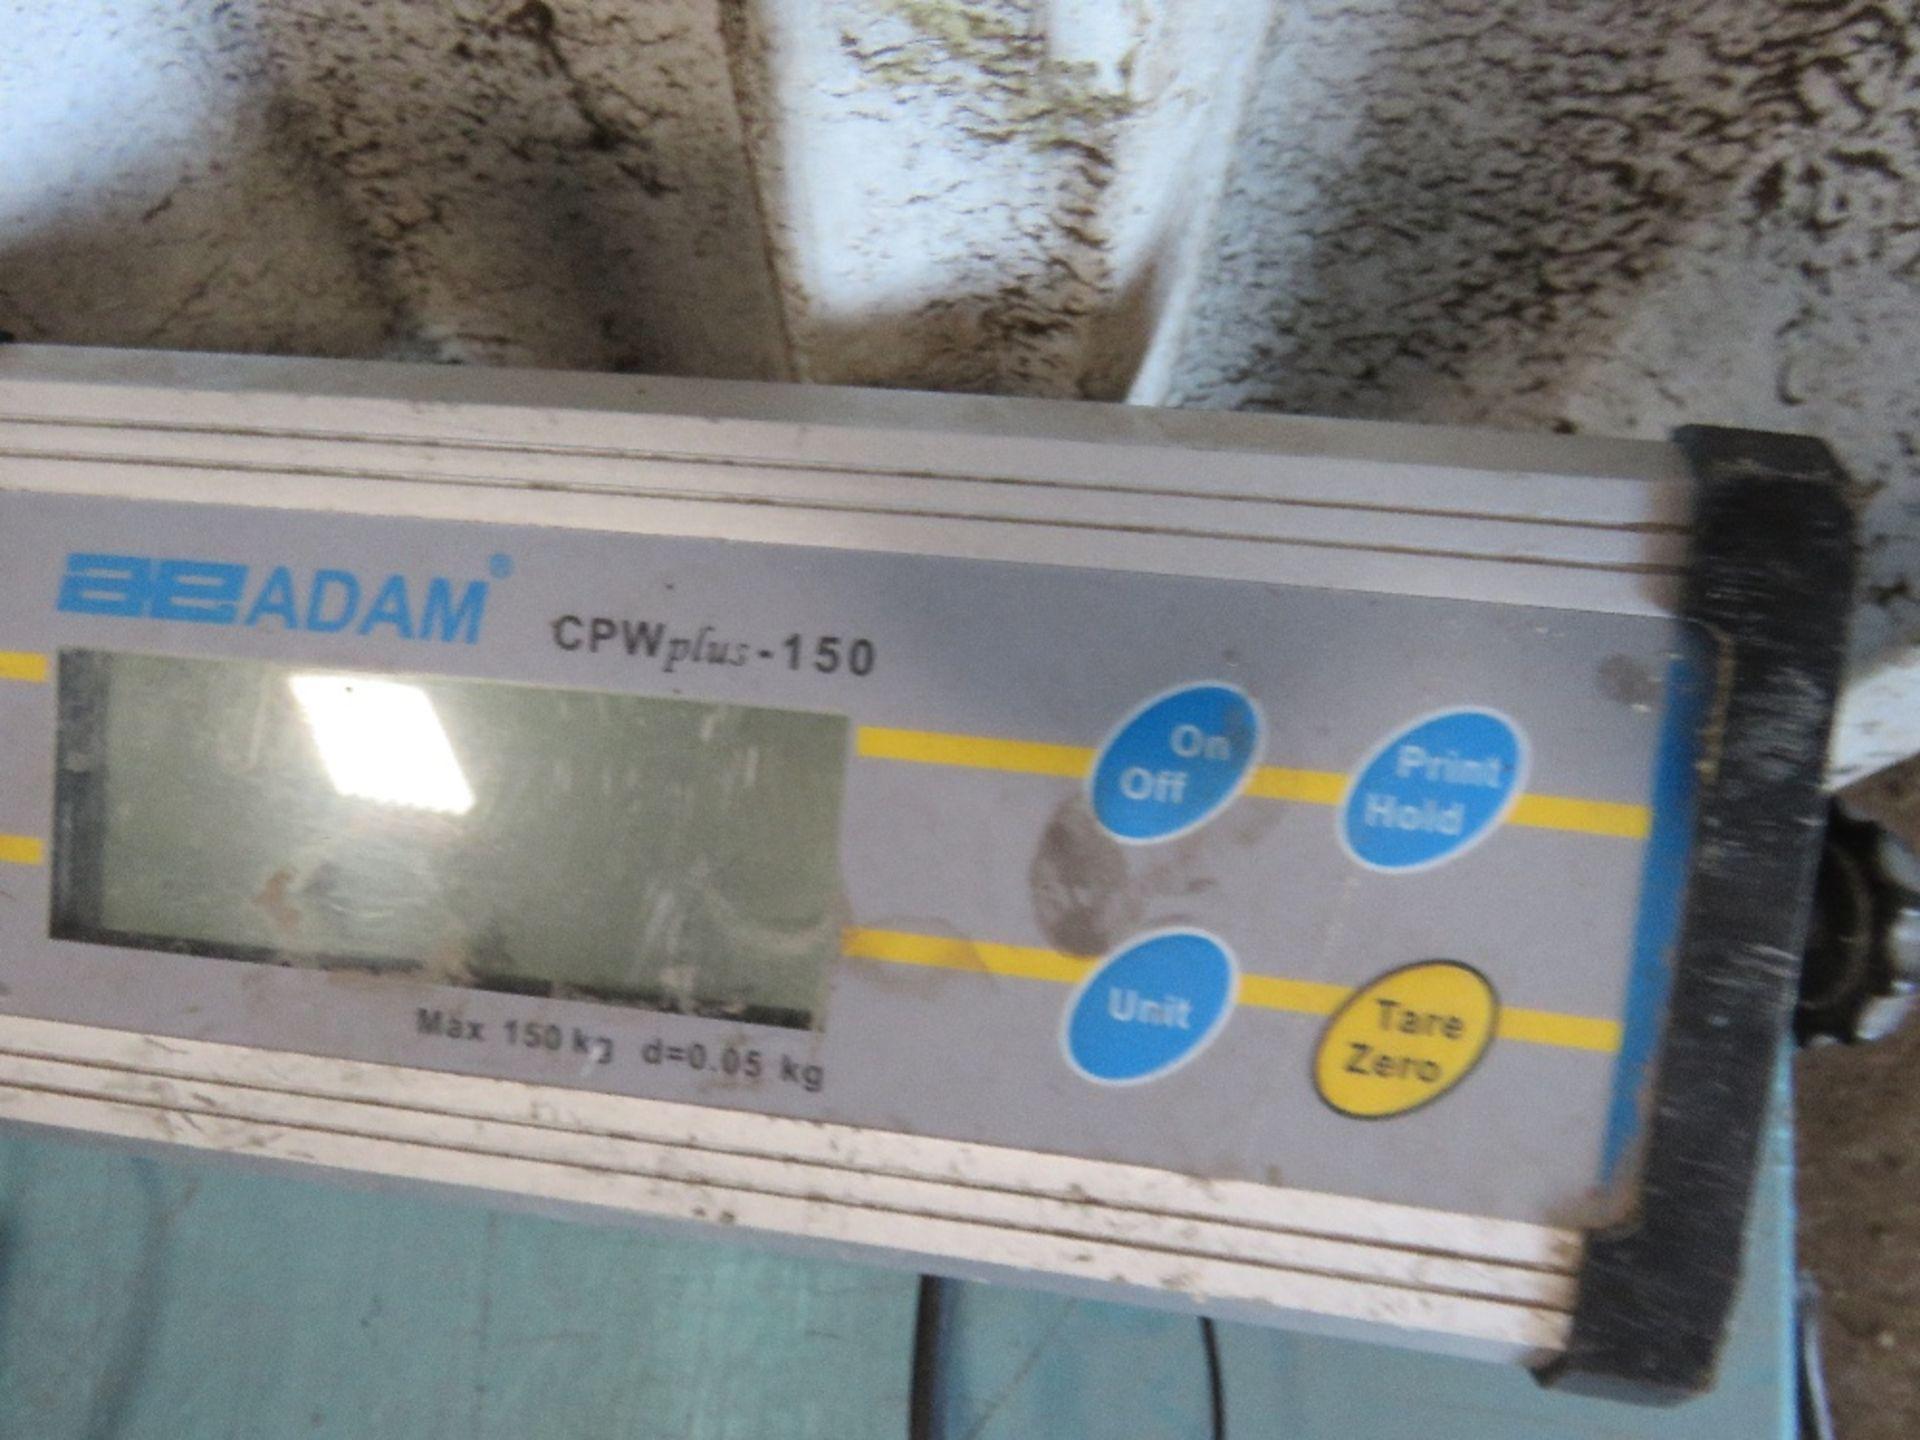 Lot 905 - ADAM ELECTRONIC SCALES....EX COMPANY LIQUIDATION